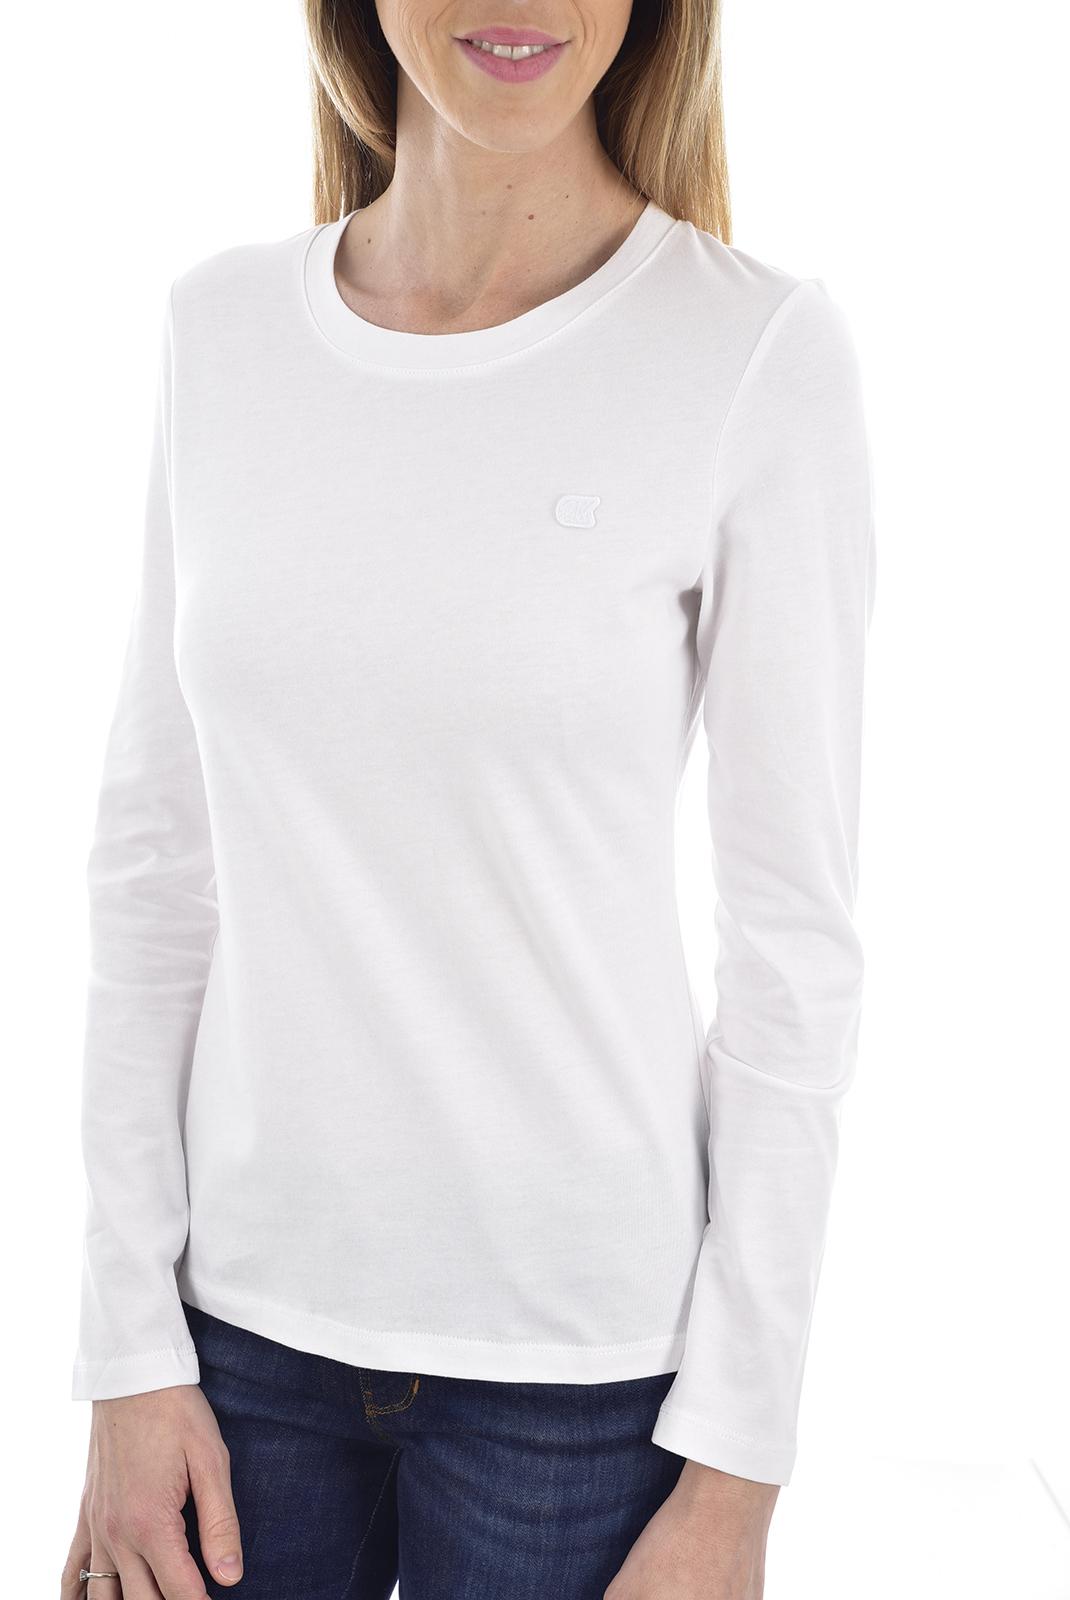 Tee shirt manches longues  Calvin klein J20J212586 YAF Bright White